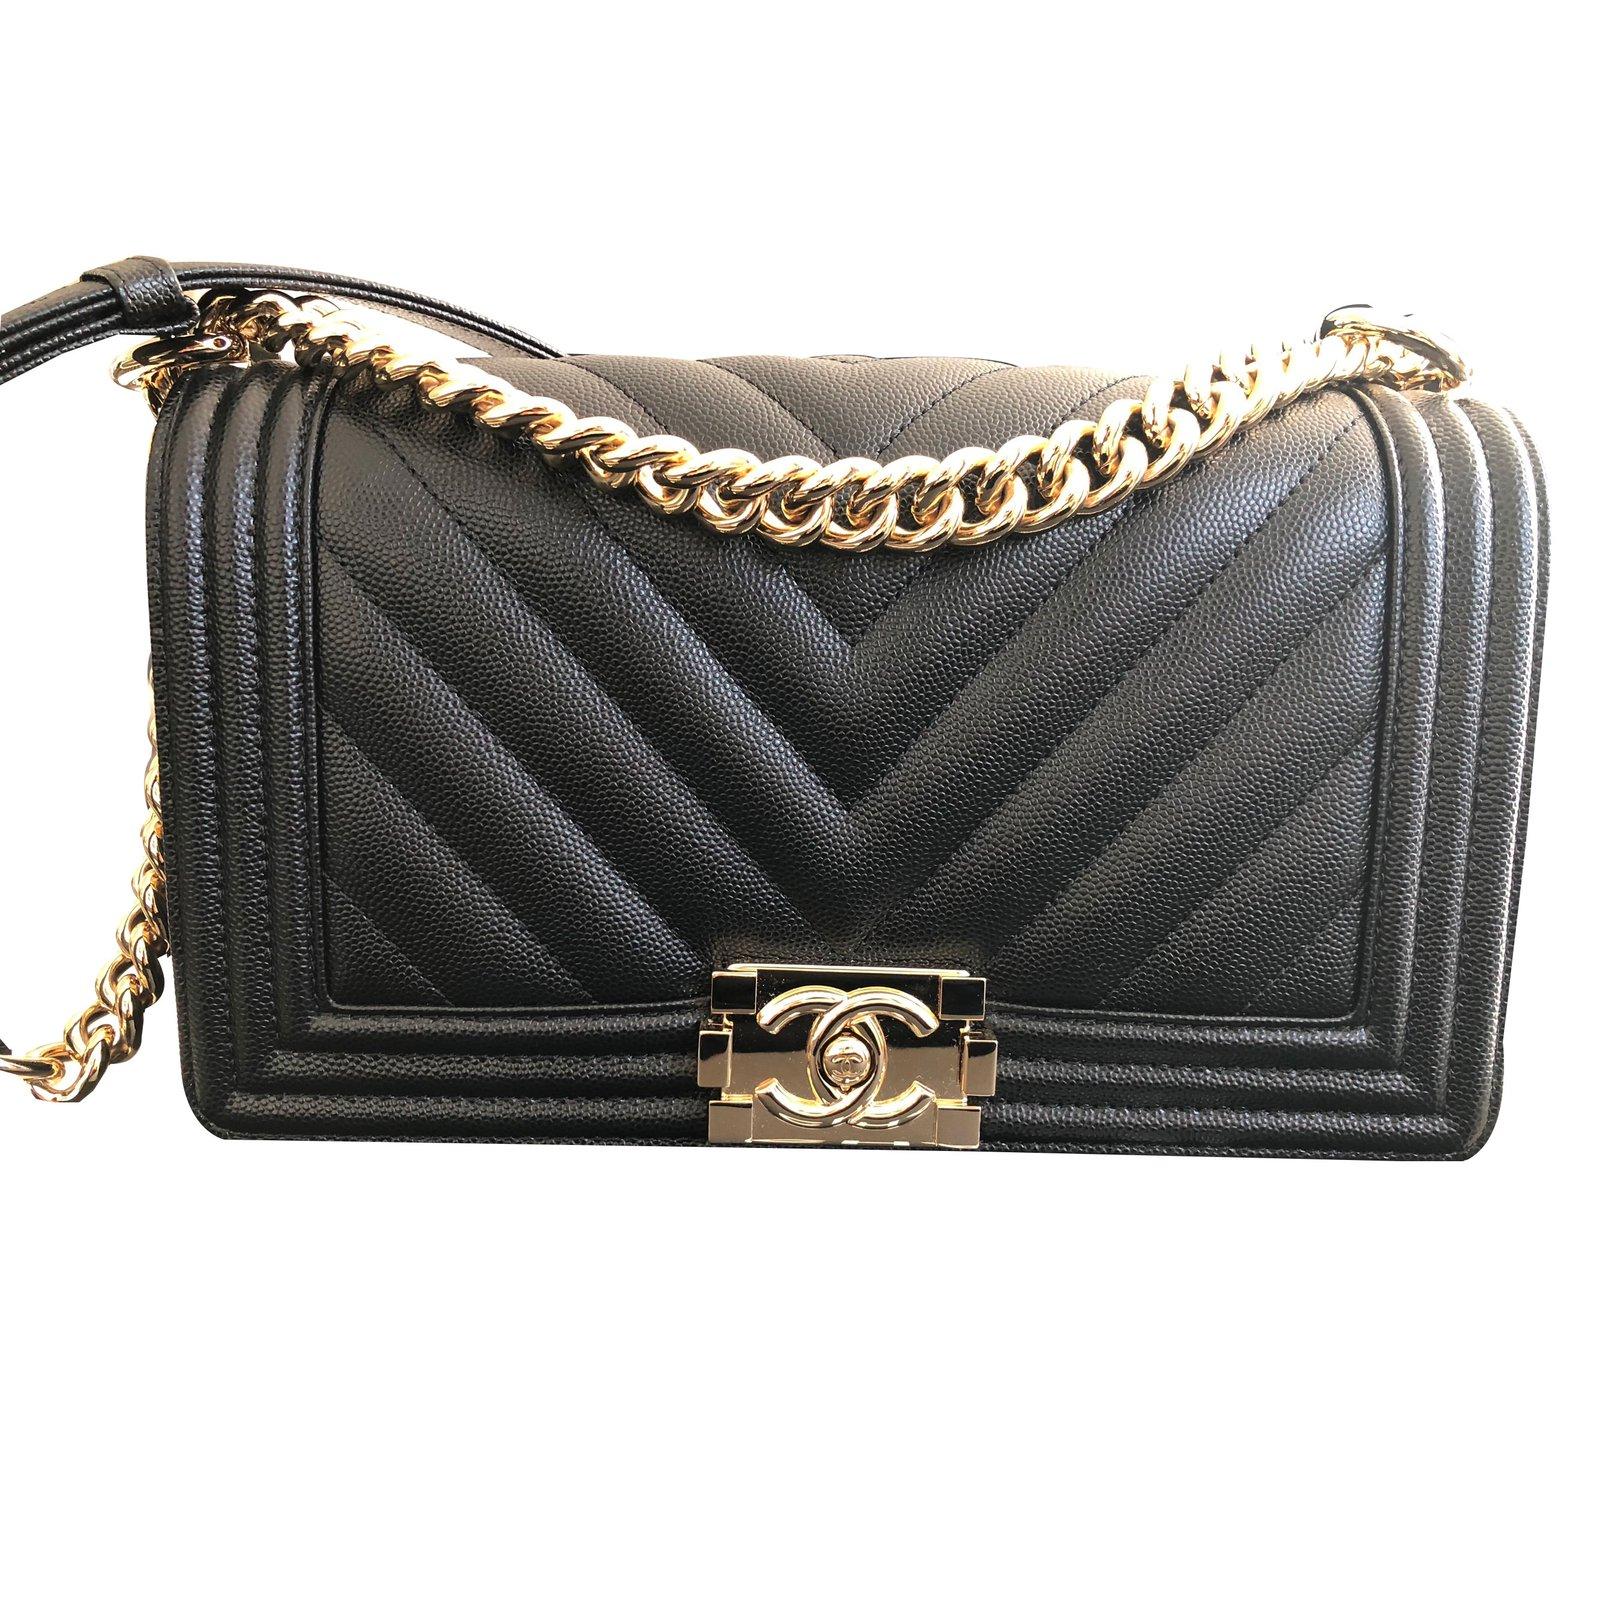 1436e44f4f7 Chanel Sac Boy Handbags Pony hair Black ref.85068. Description ...